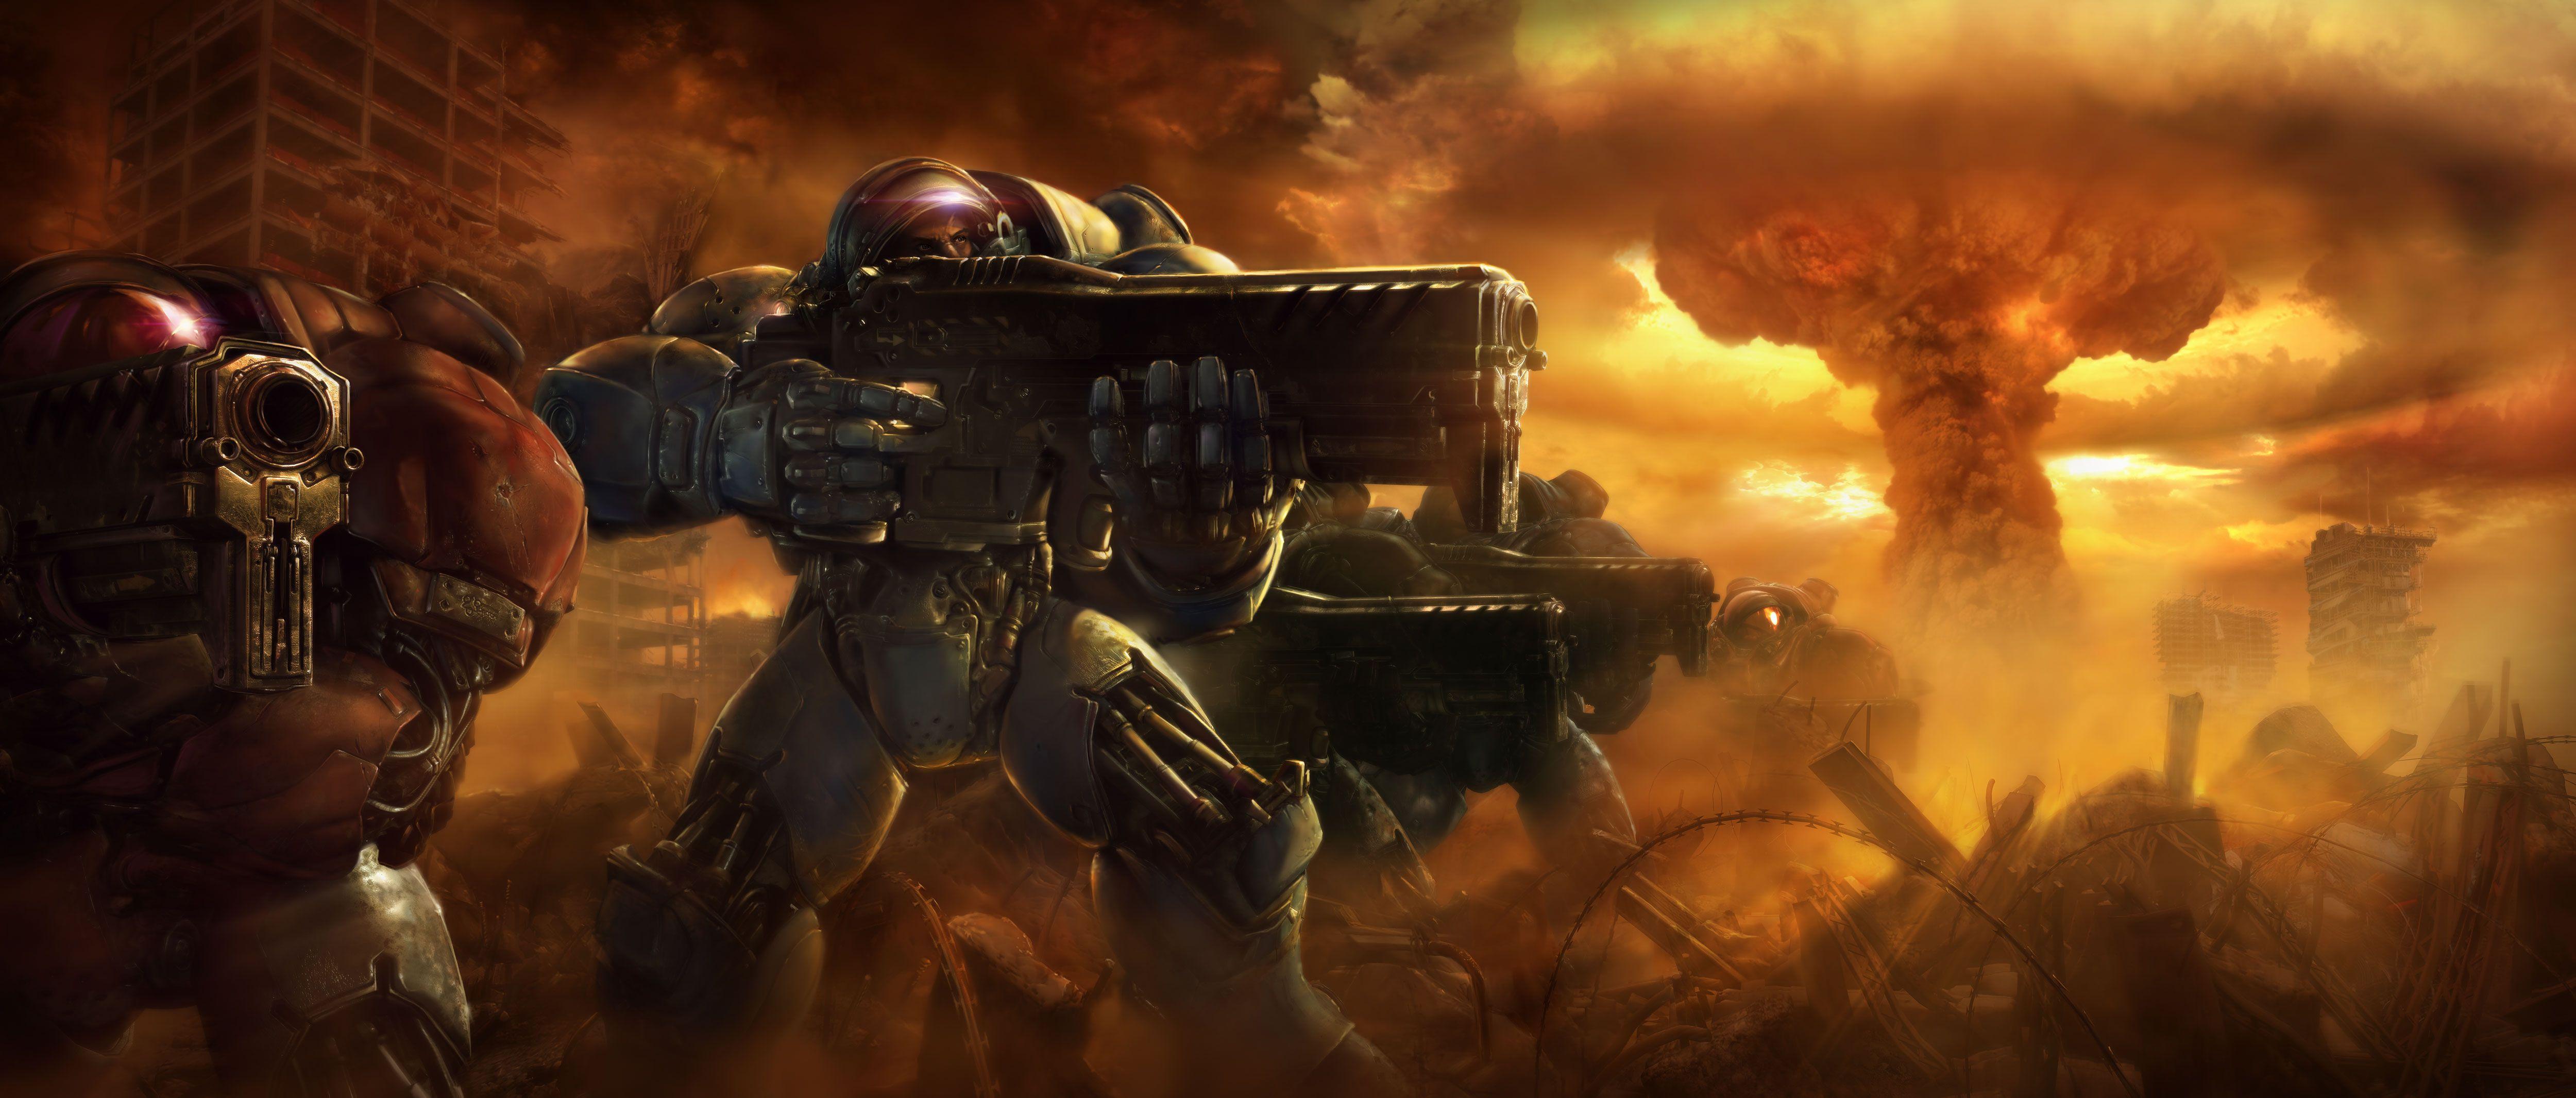 video, Games, Terran, Us, Marines, Corps, Artwork, Tyrchus